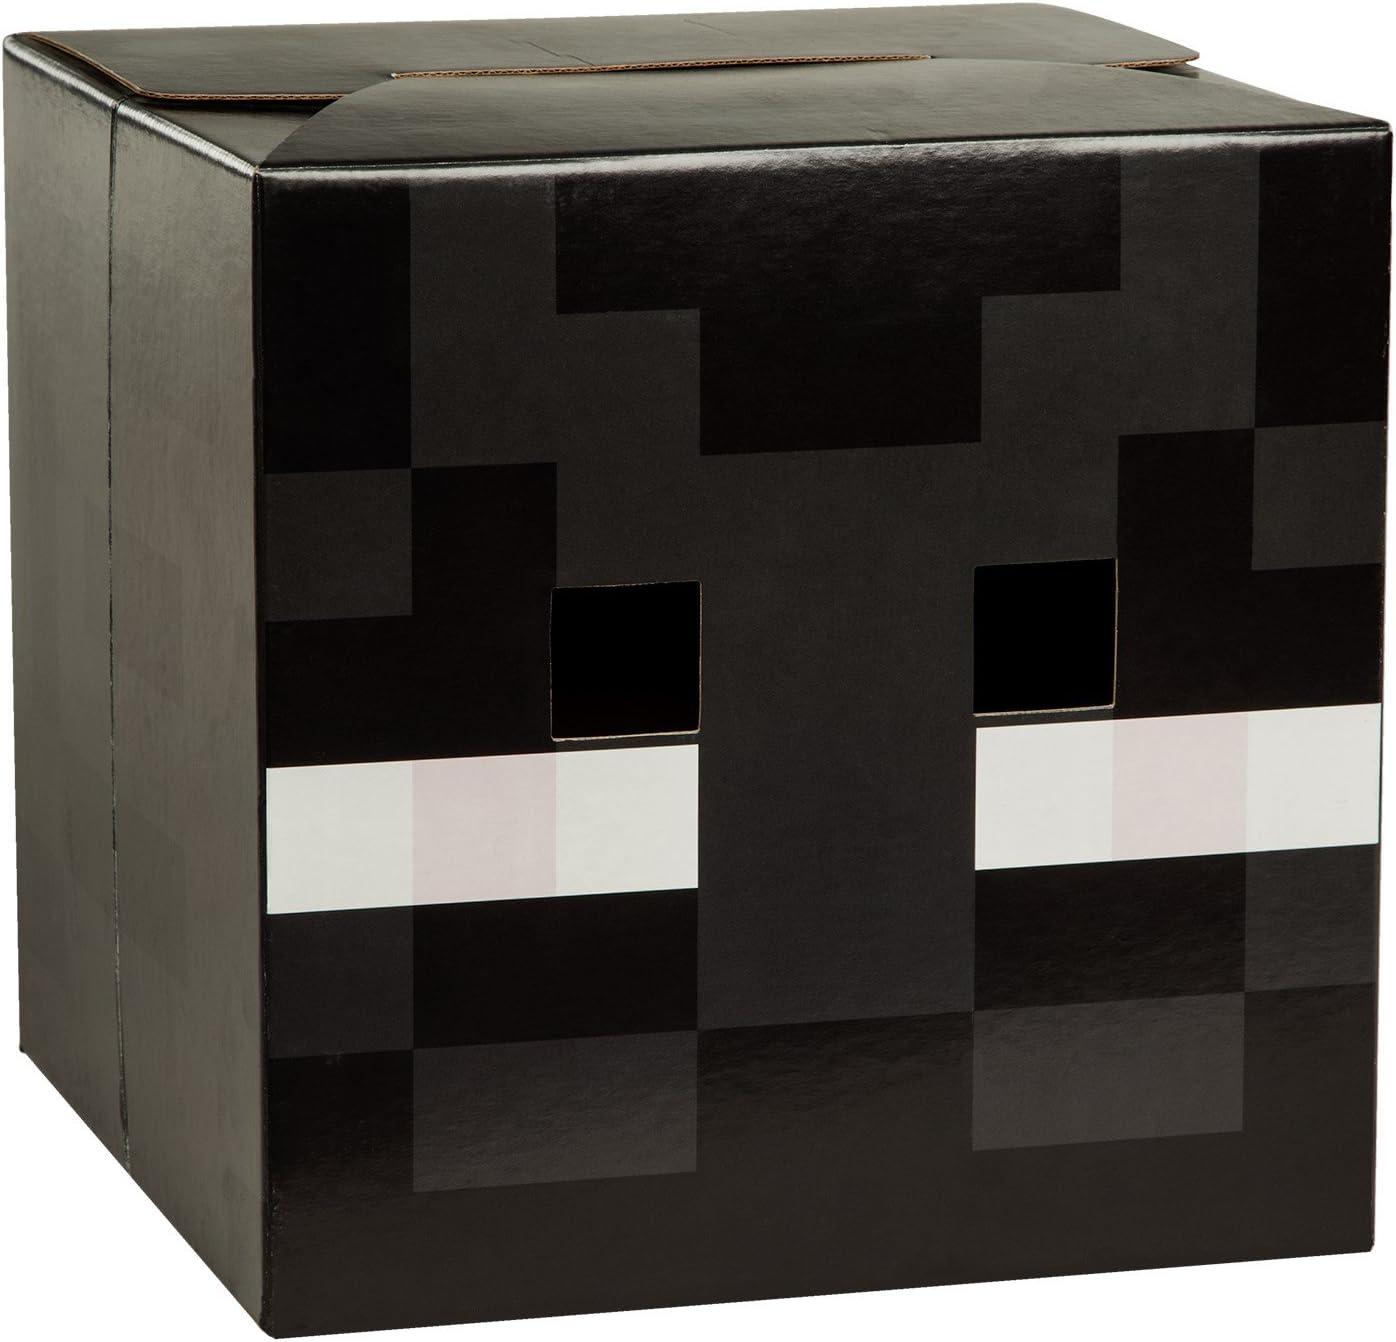 JINX Minecraft Enderman Head Costume Mask, Cardboard, 9x9x9 inches